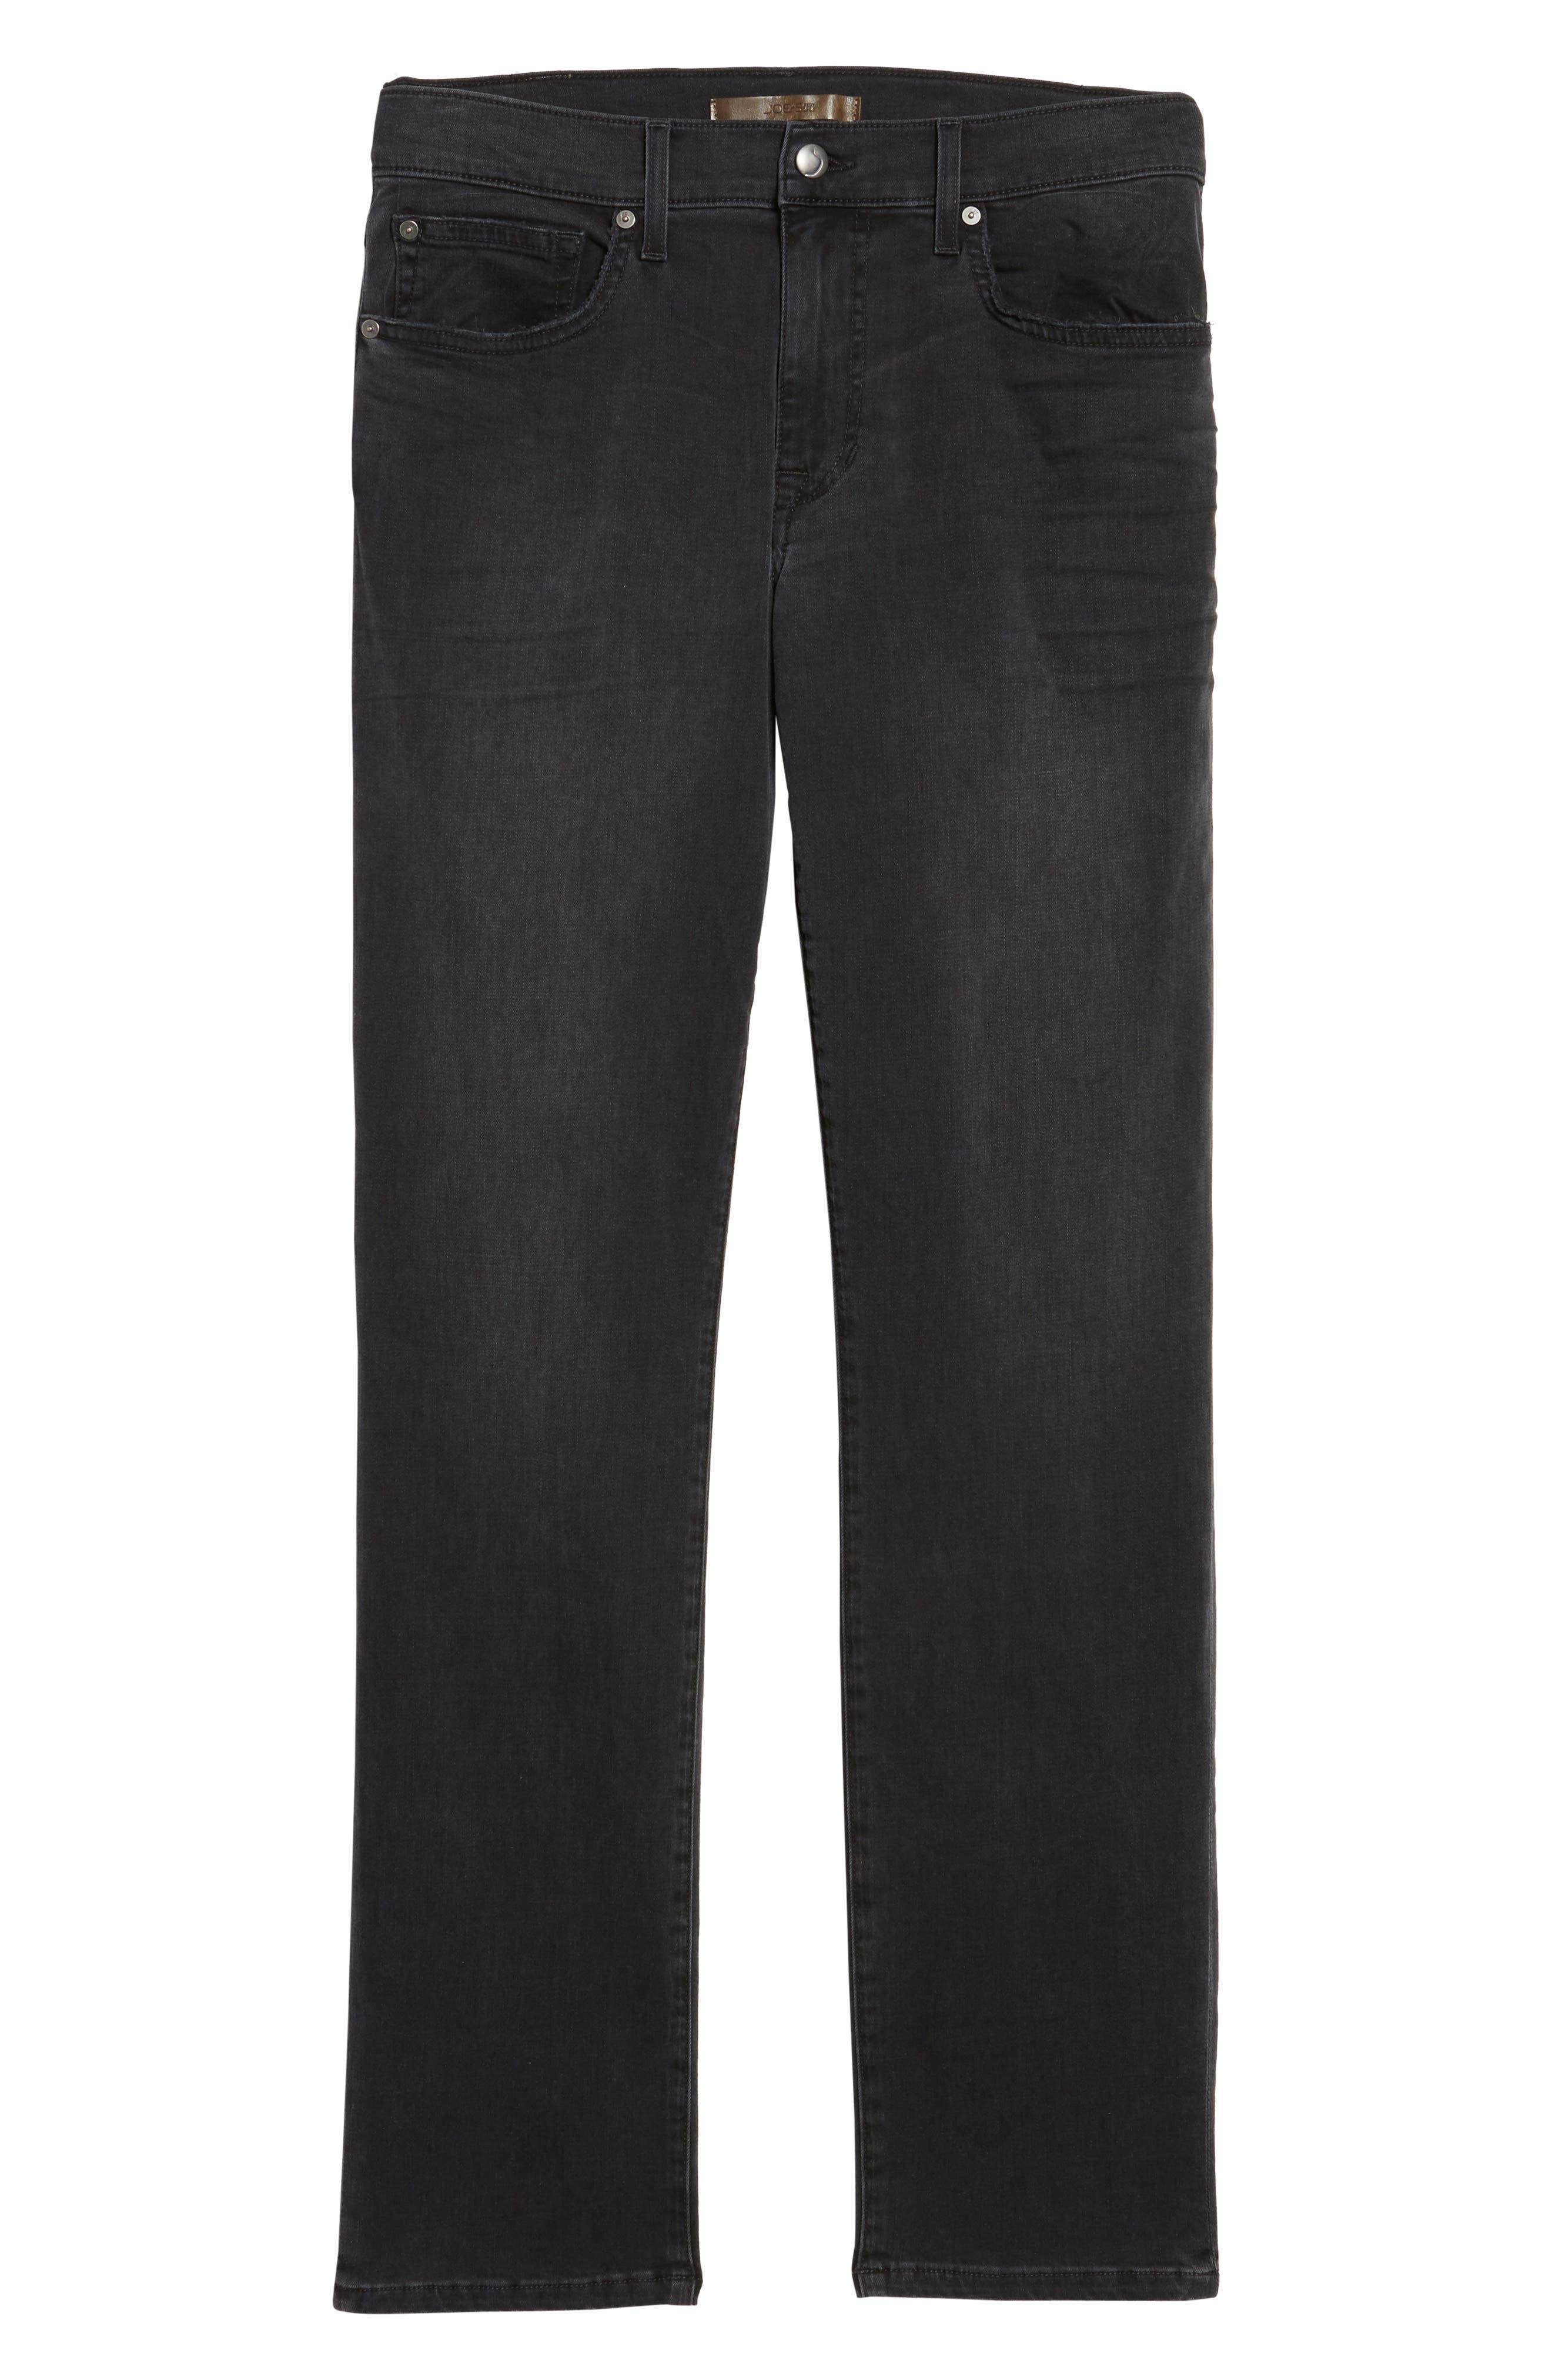 Brixton Slim Straight Fit Jeans,                             Alternate thumbnail 6, color,                             015